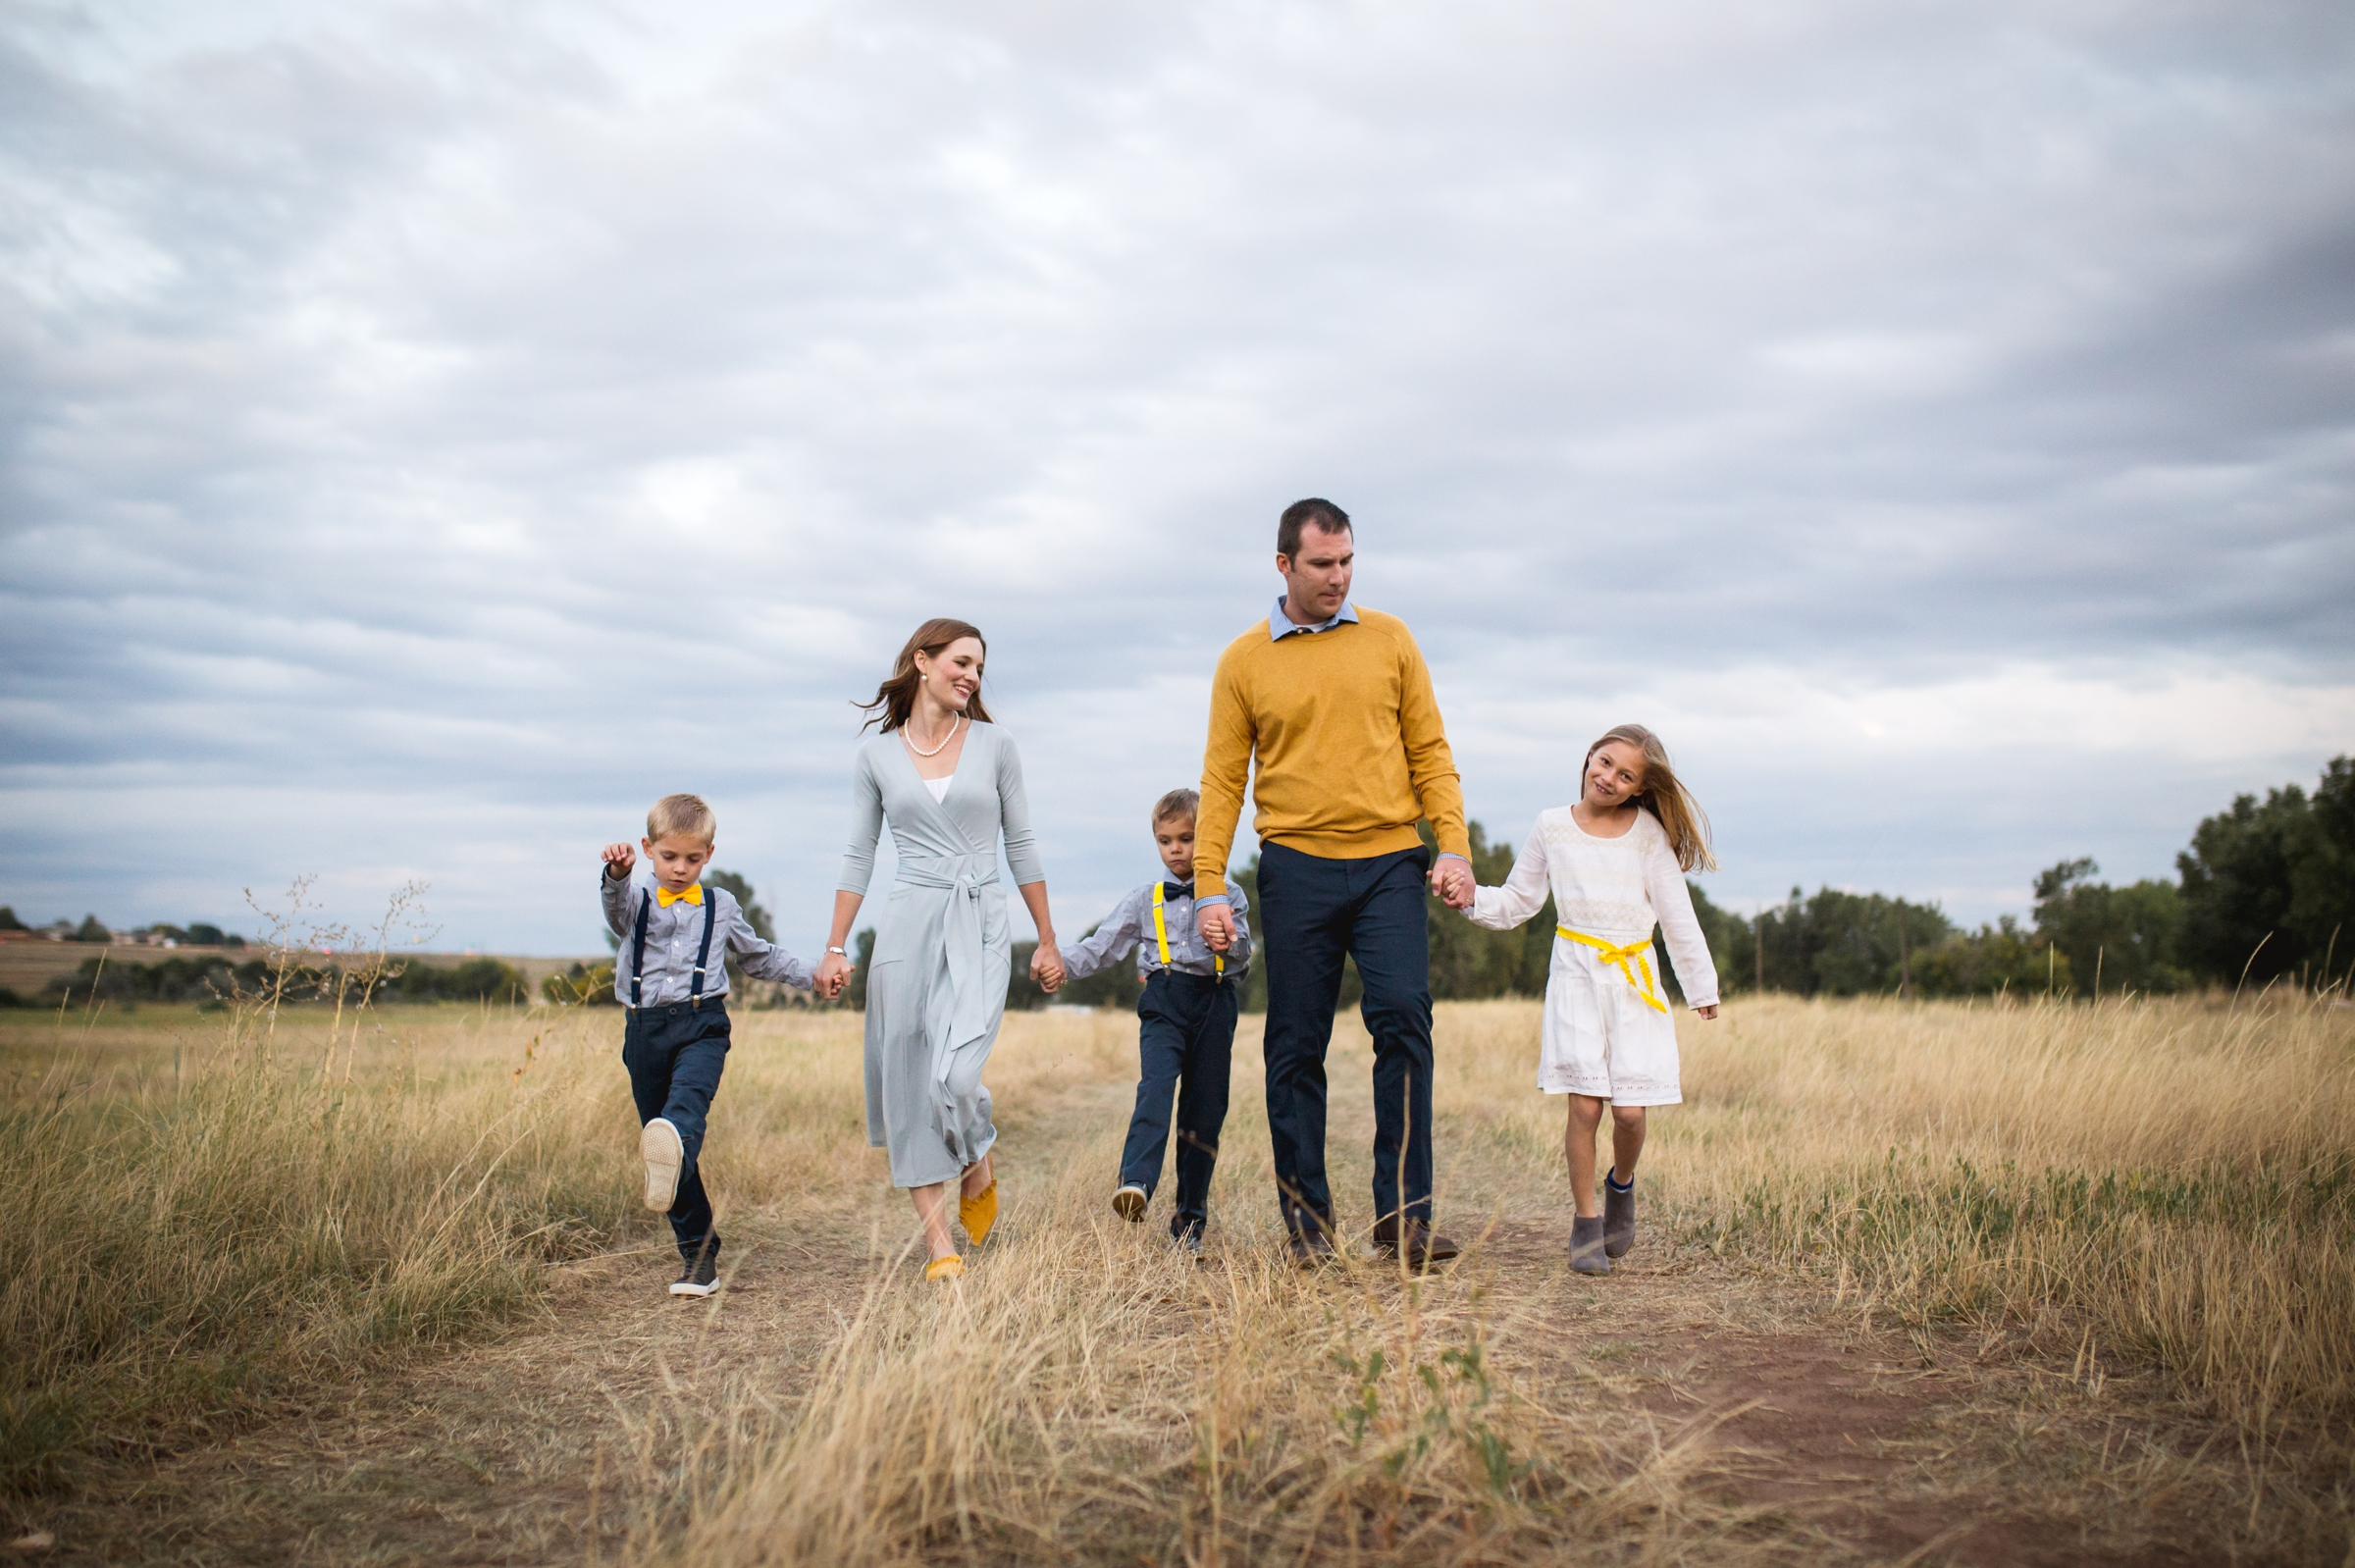 creative family photographer, best family photographer, fun family photographer